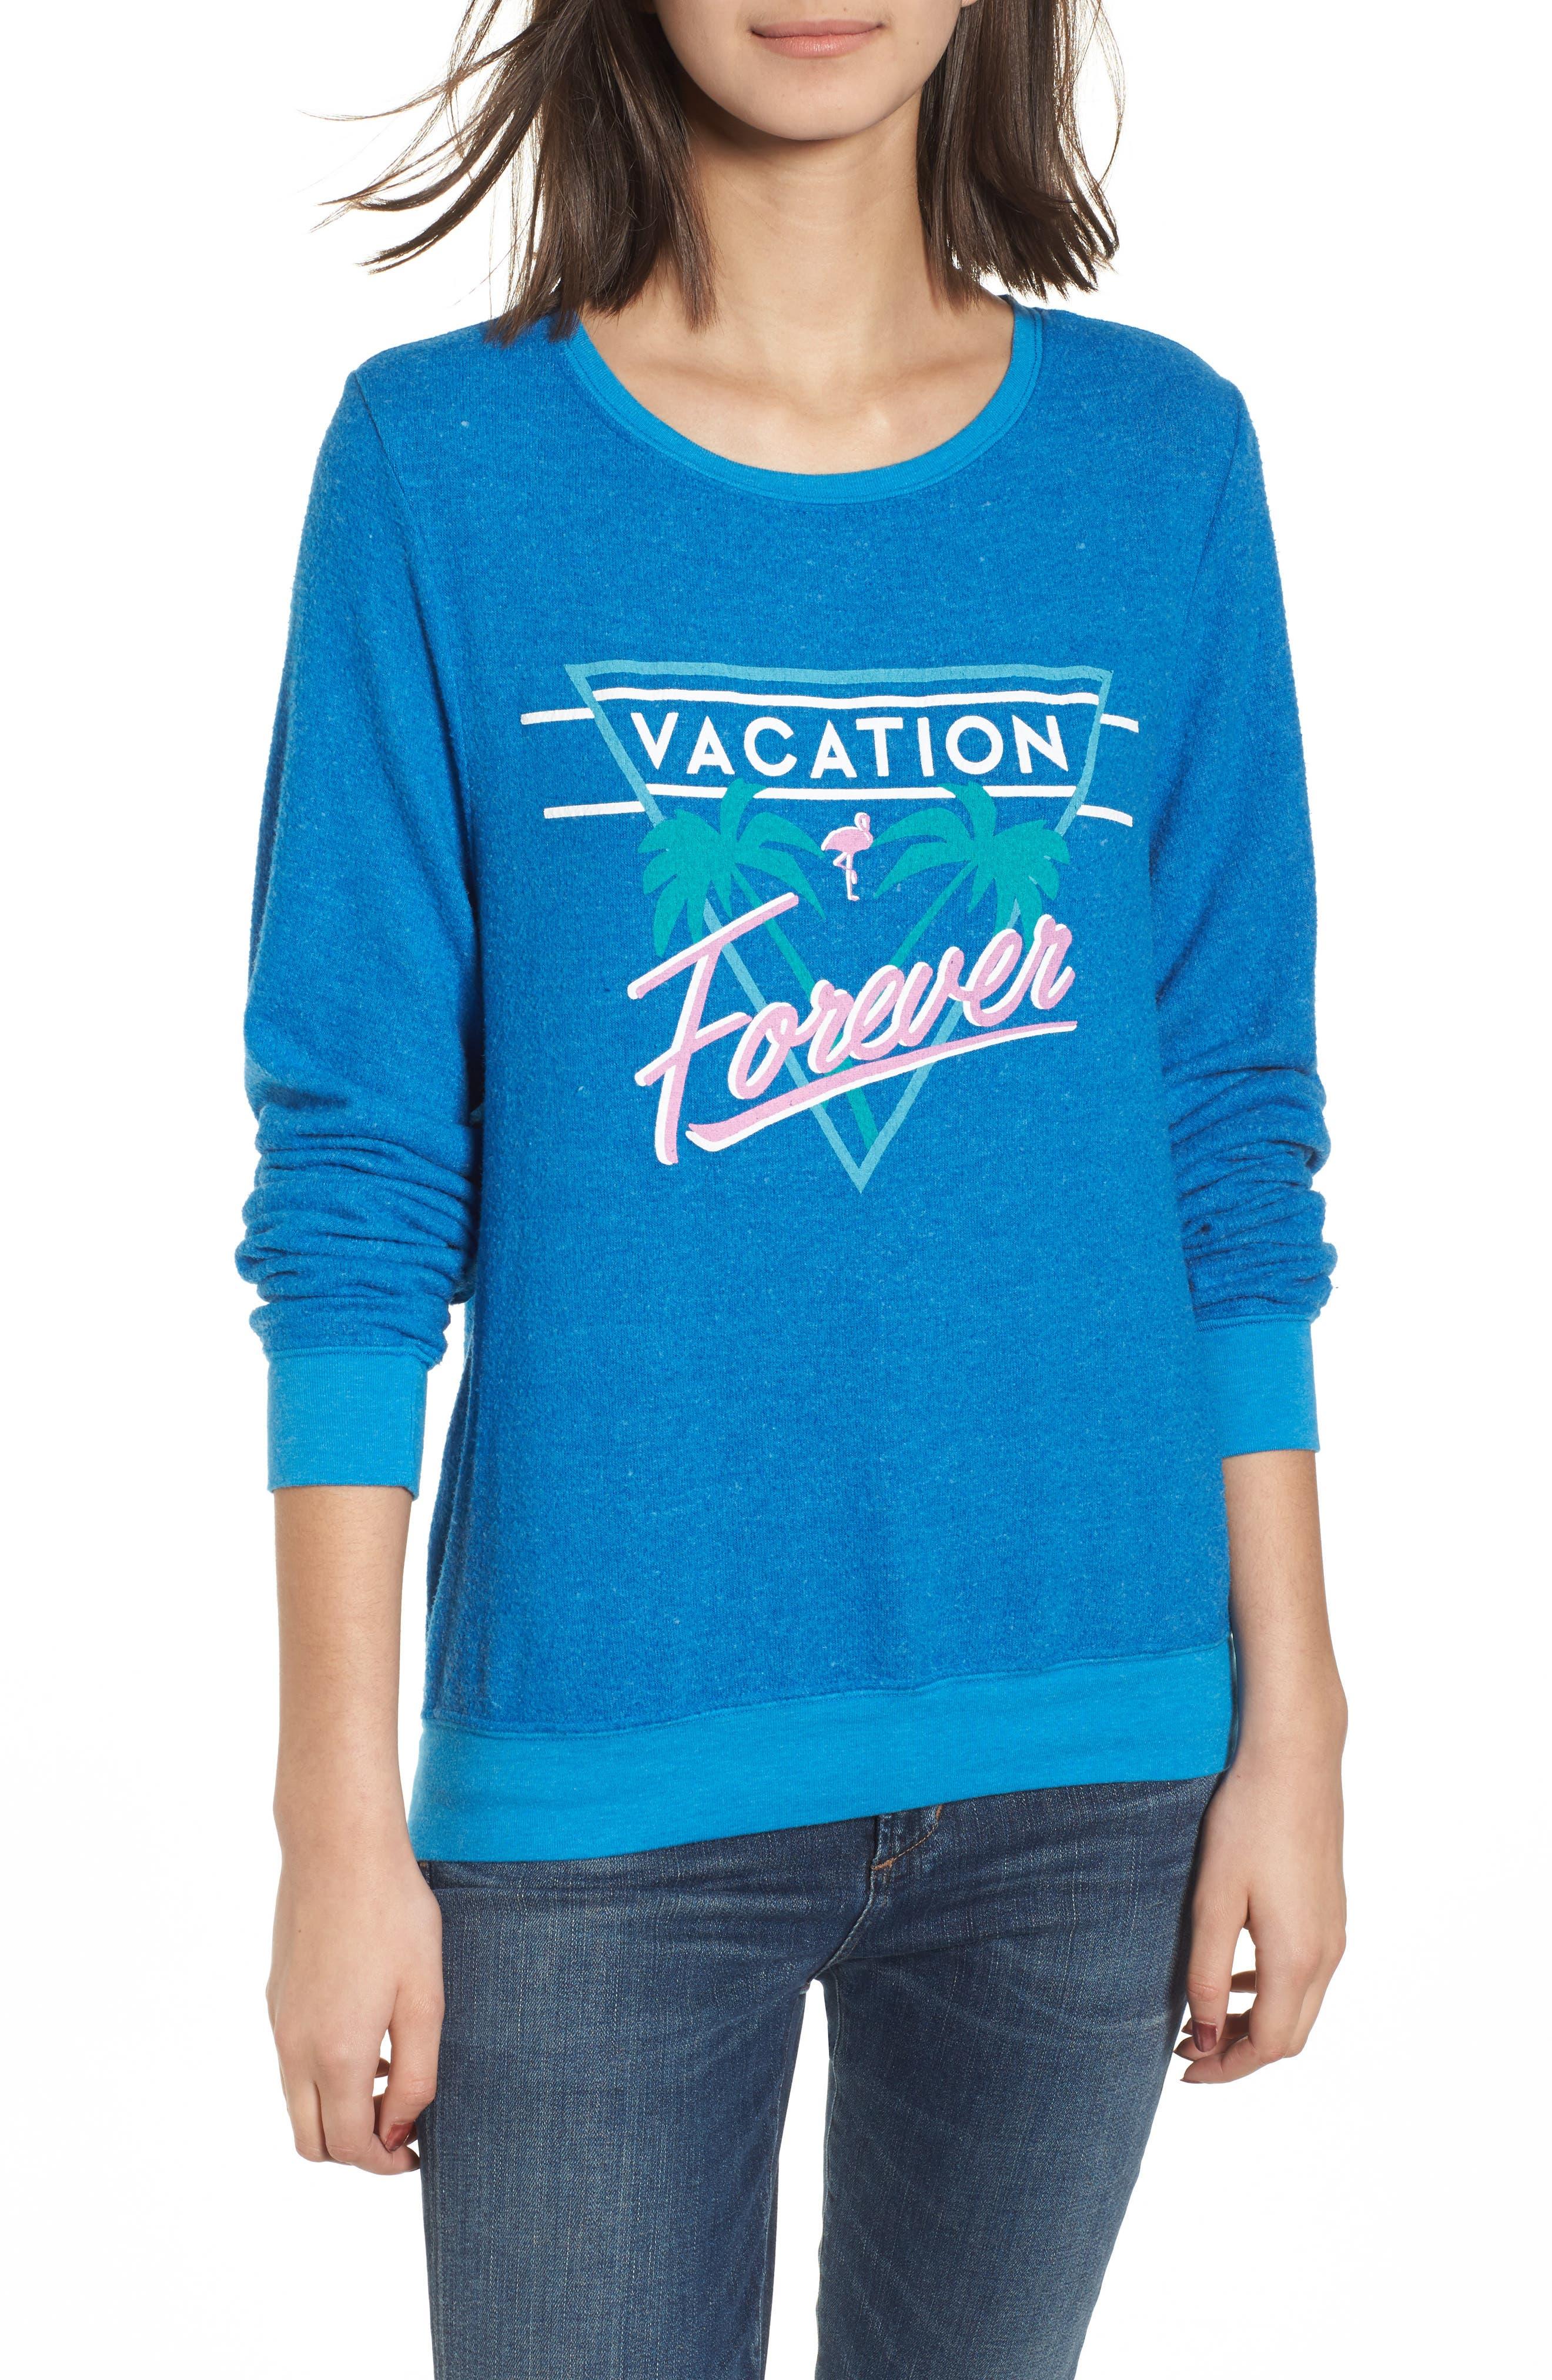 Vacation Forever Sweatshirt,                         Main,                         color, Cobalt